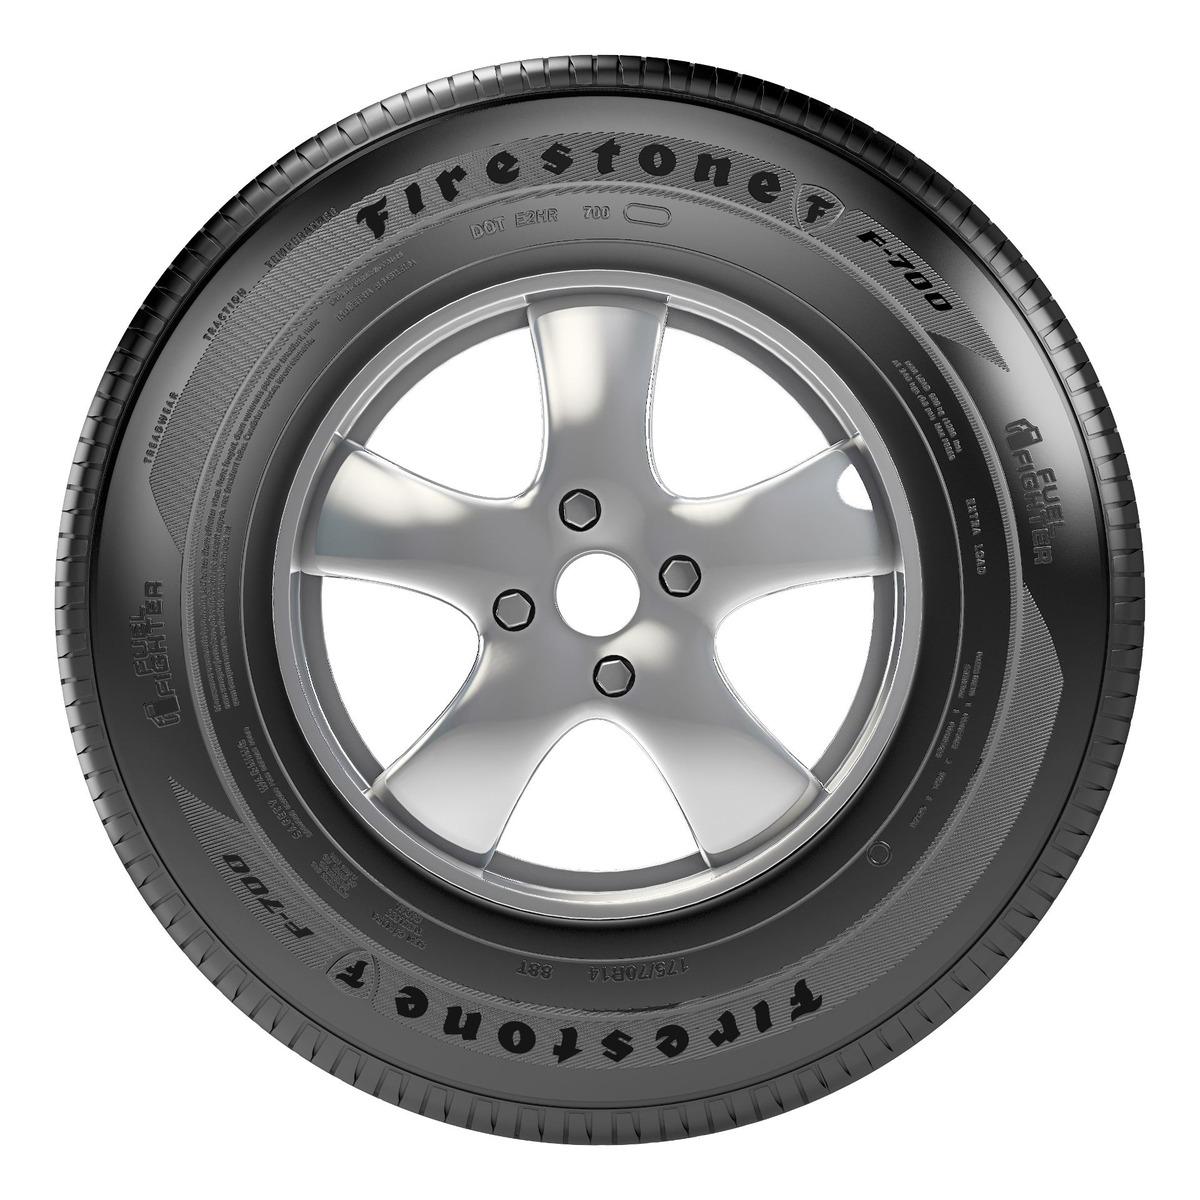 Neumático 165/70R13 79T F-700 FIRESTONE